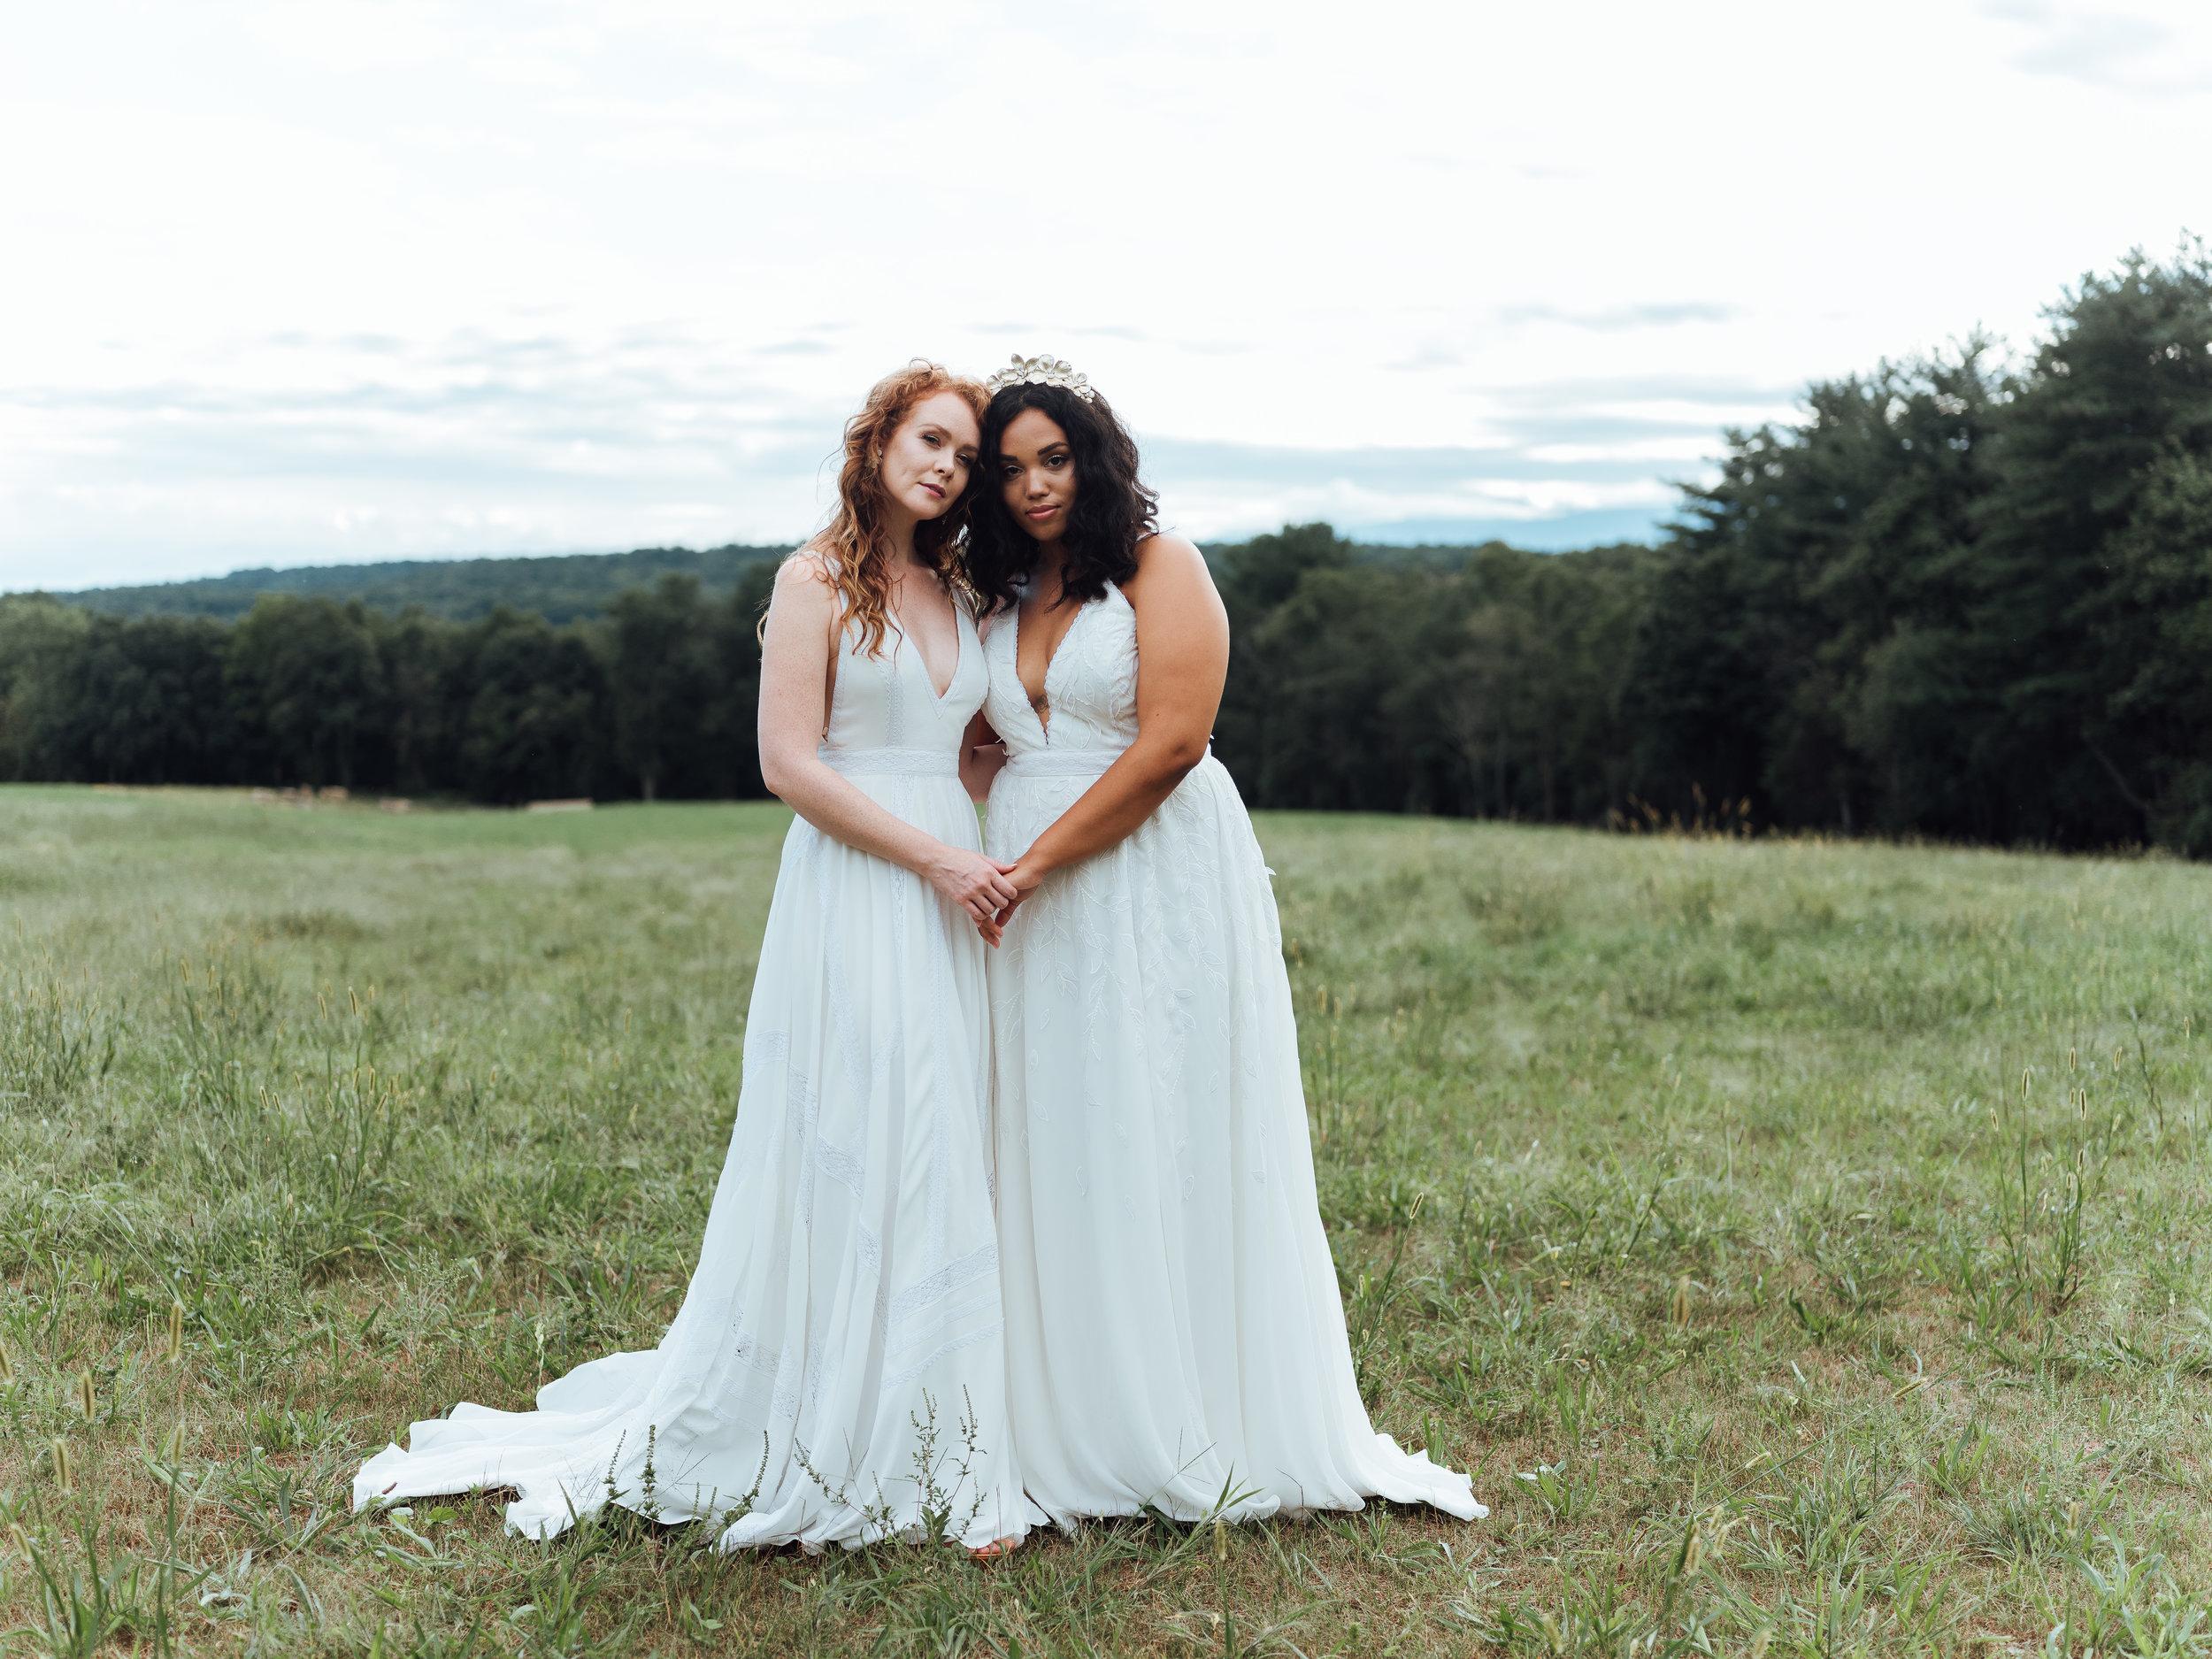 WSPCo-Gather-Greene-Rebecca-Schoneveld-Bridal-208 copy.jpg